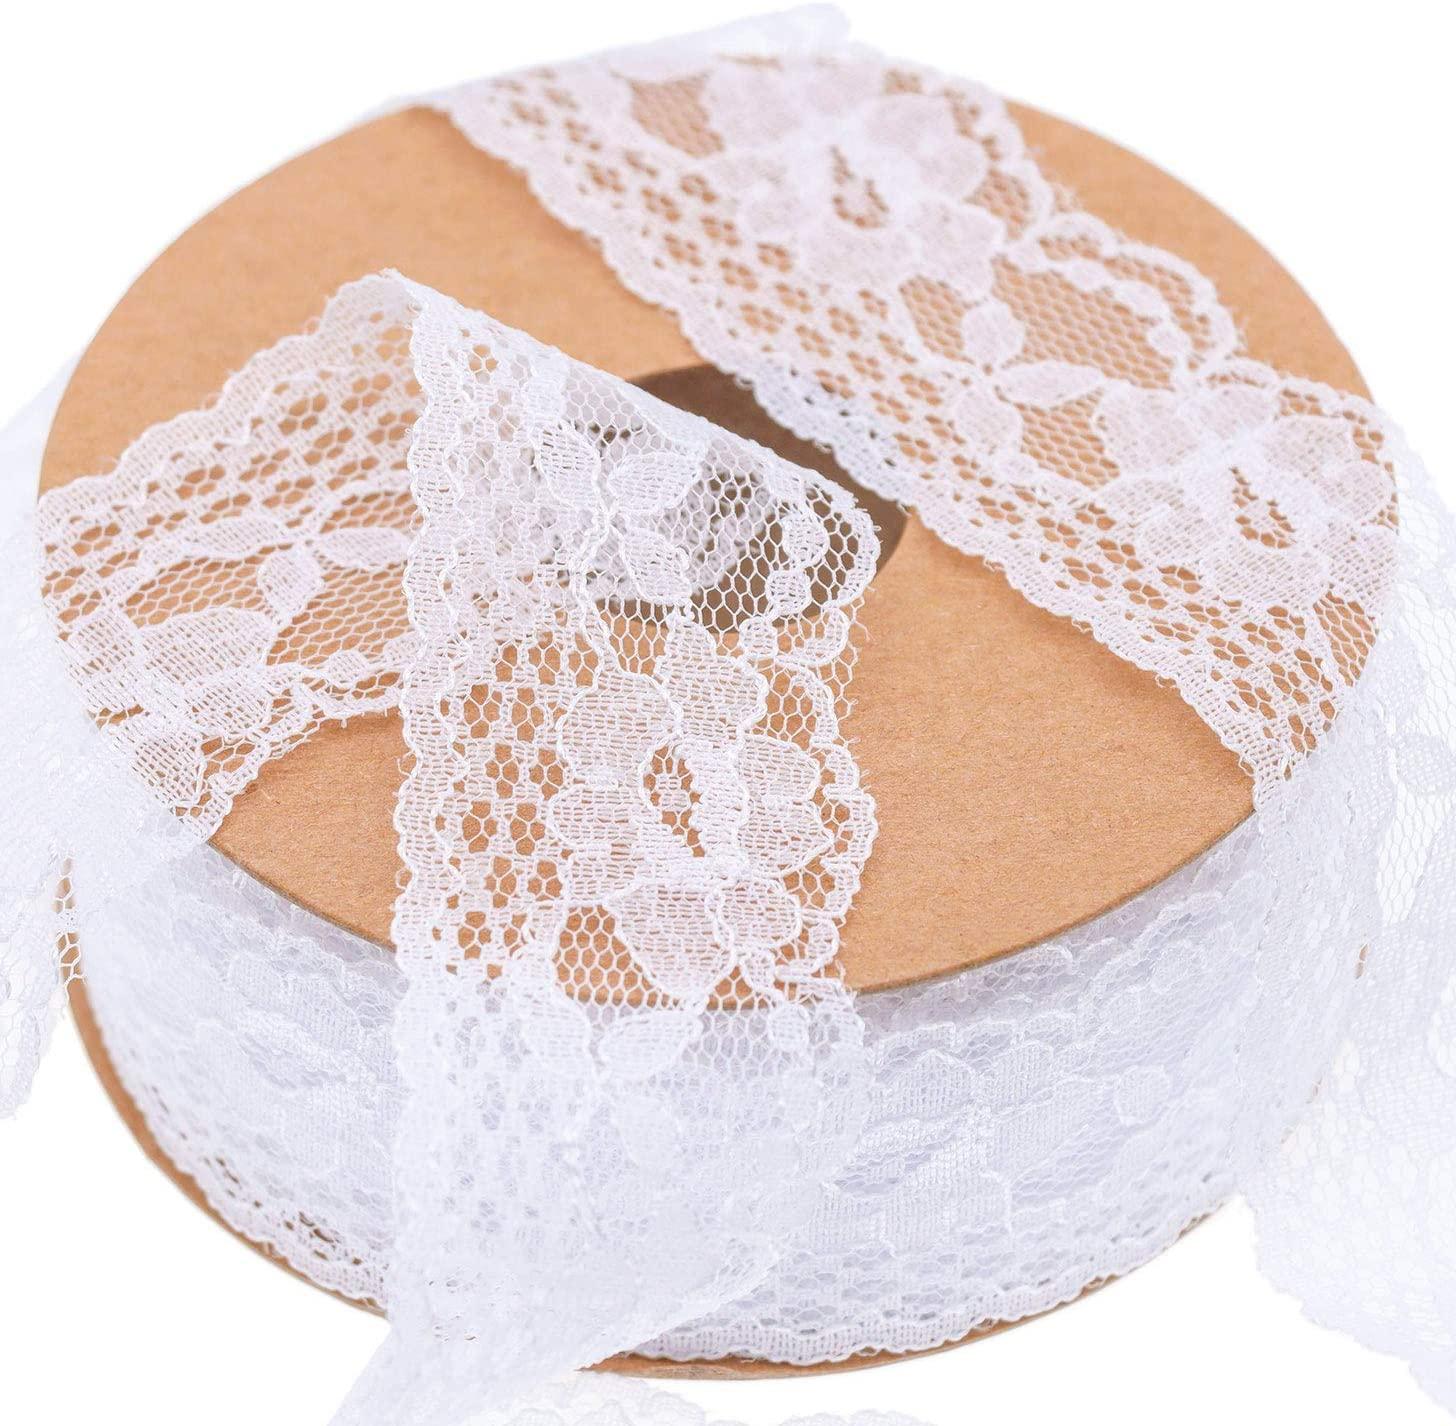 Floral Lace Trim - KAIDILA 25 Yard White Lace Ribbon For Gift Wrapping,Wedding Invitation,Garment Embellishments